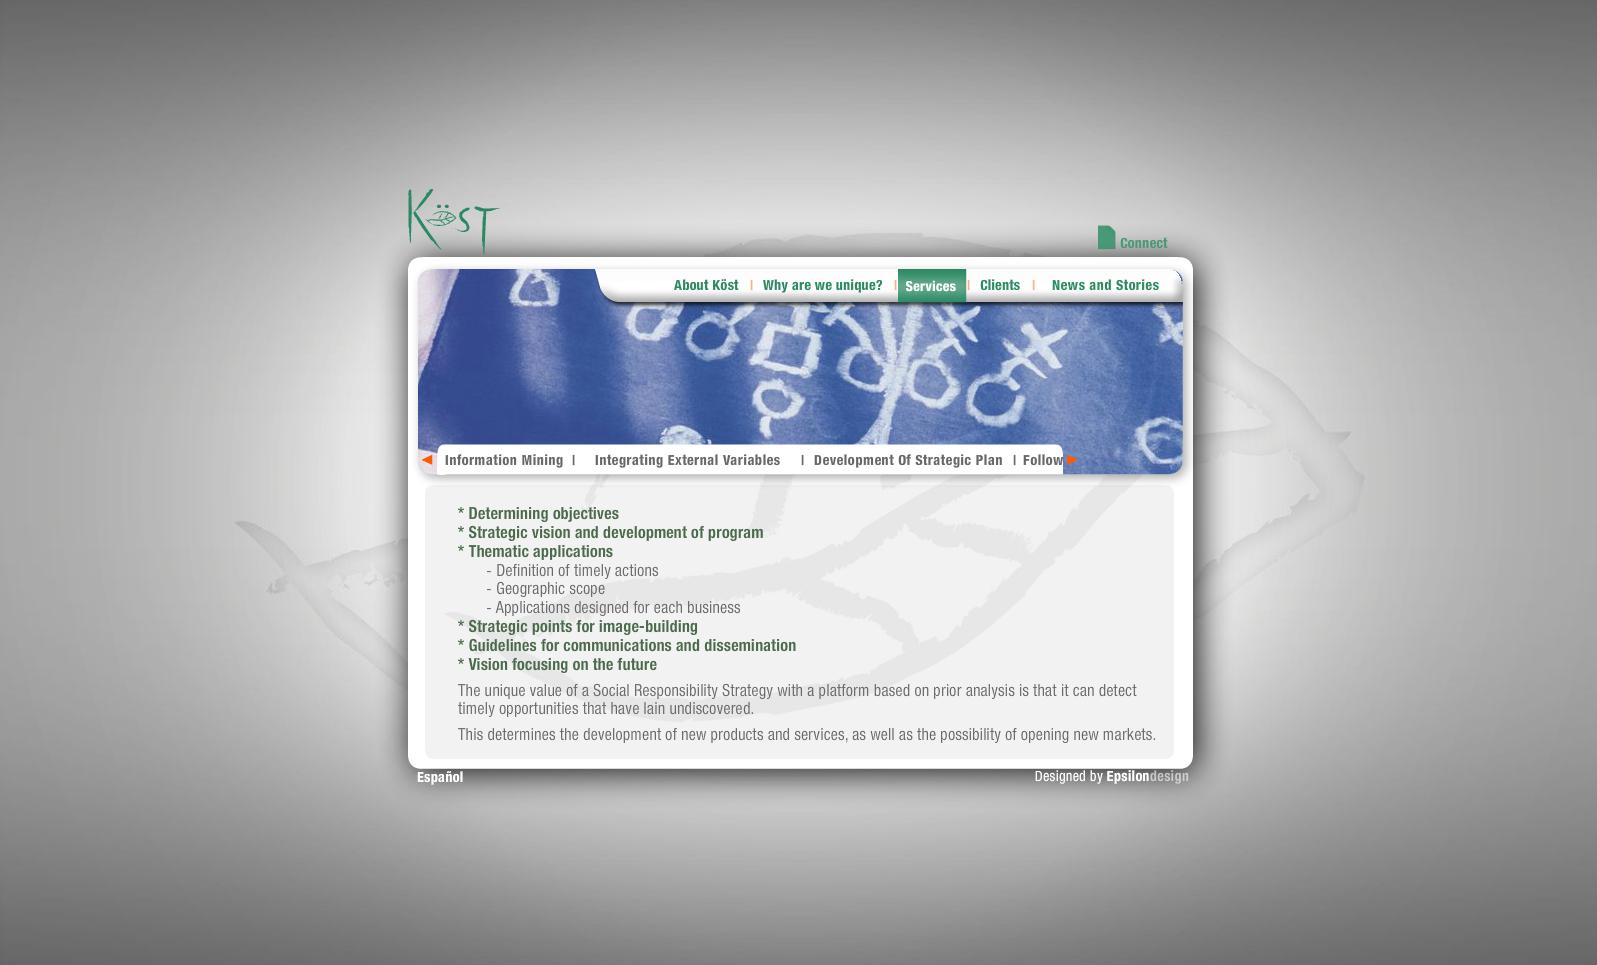 Green Kost - Services (Development of strategic plan)